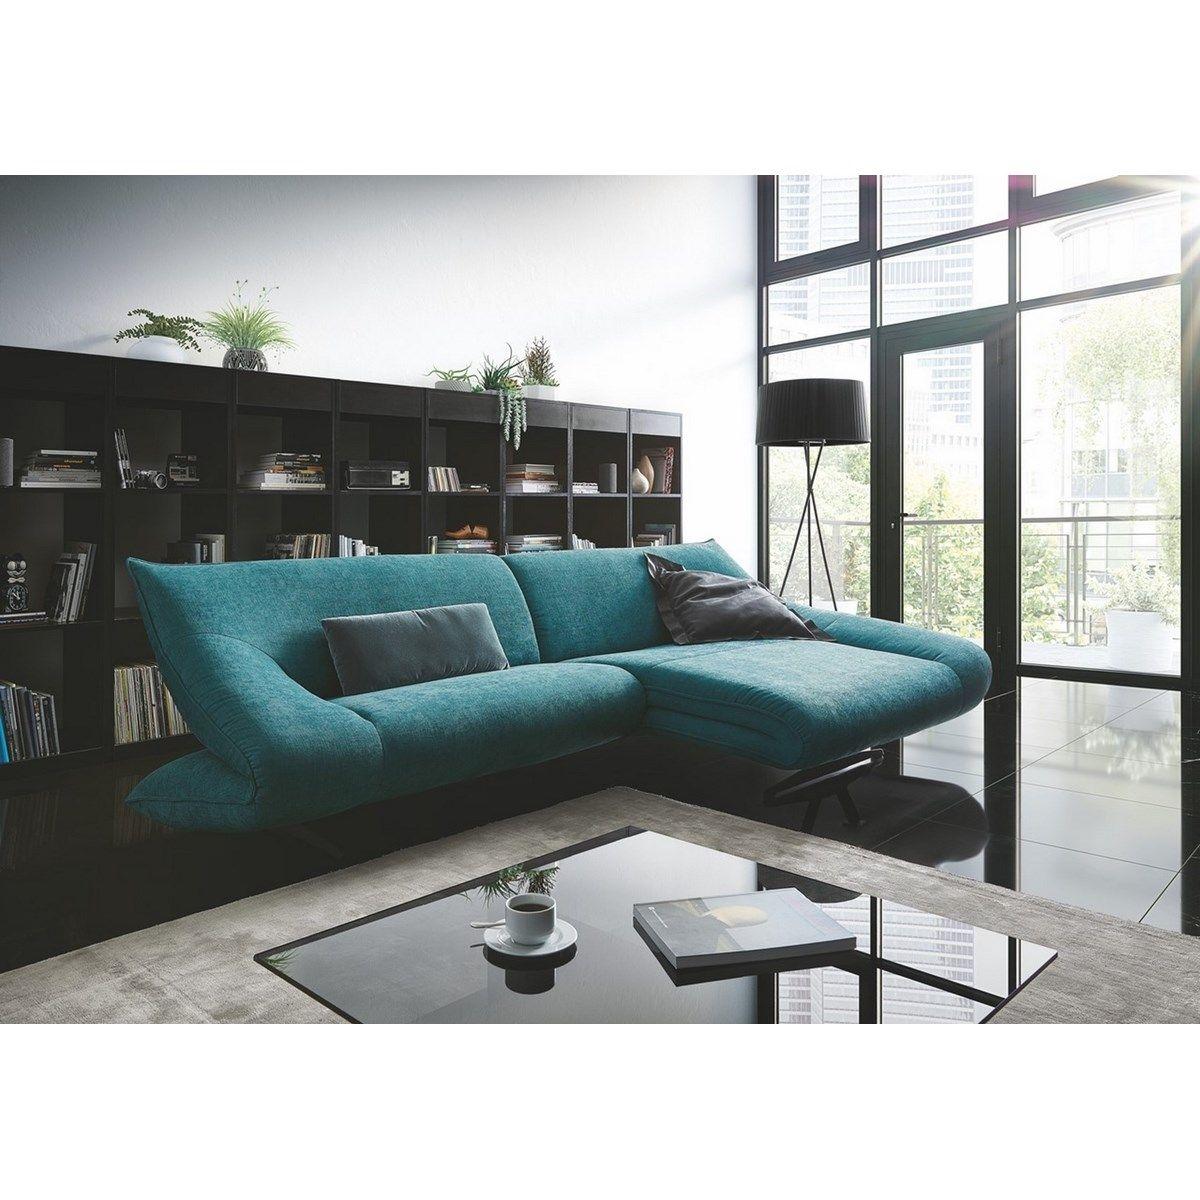 Canapé angle design HARTEROS avec sa chaise longue